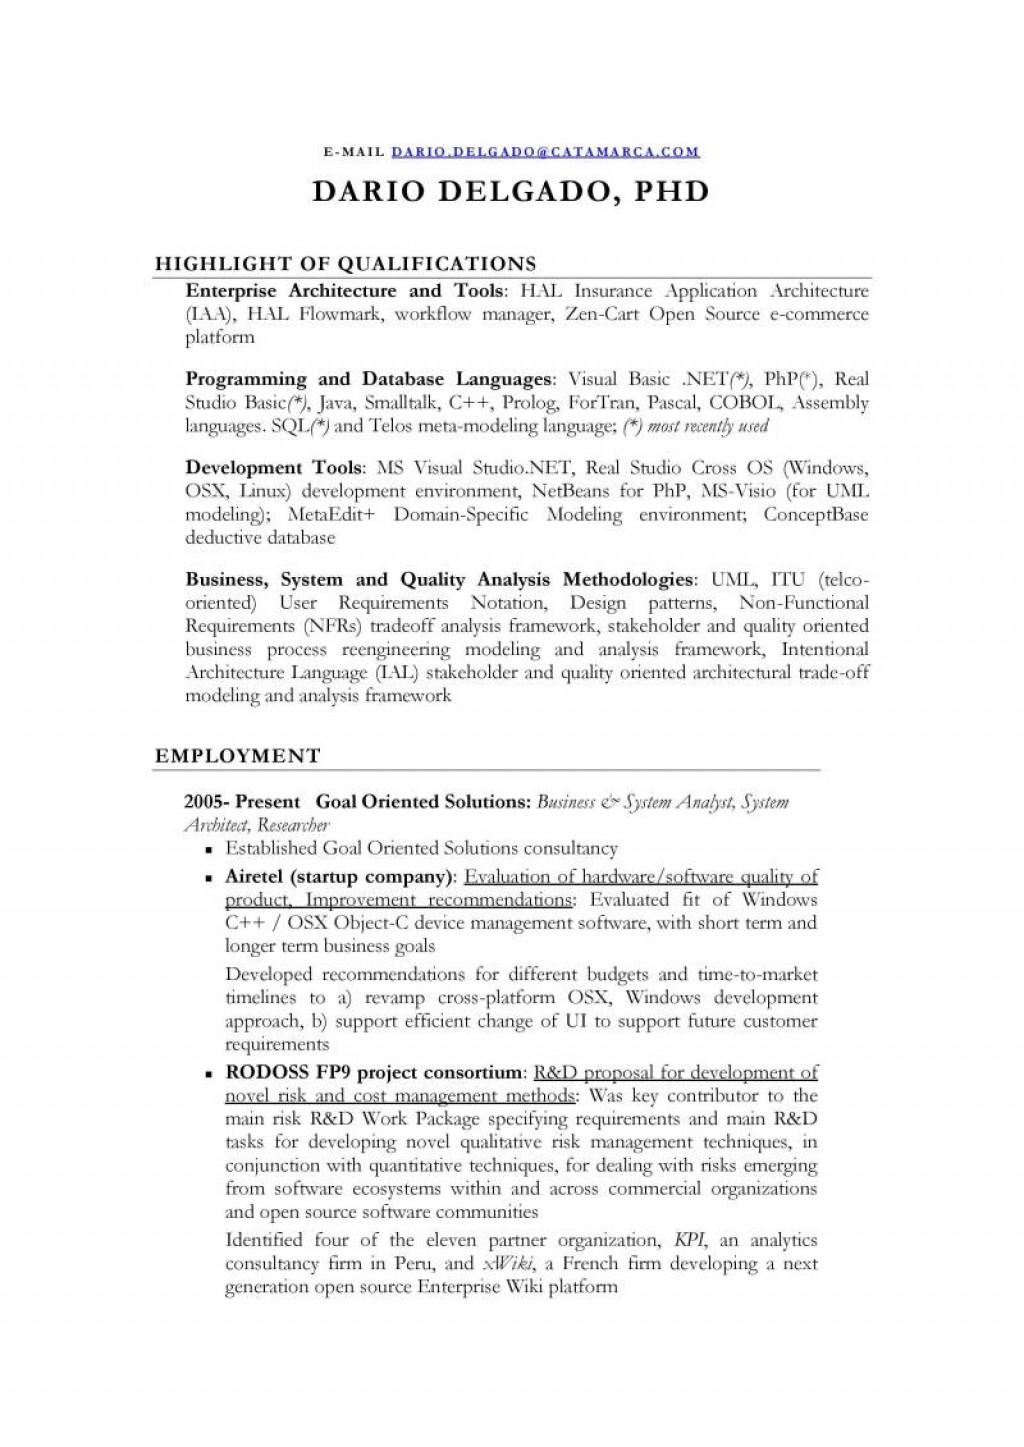 007 Sample Resume Net Developer Unique Essays Apply Texas Professional School Essay Example Of Developerresize8002c1131ssl1 Unusual Examples Topic A College 2016 C Large